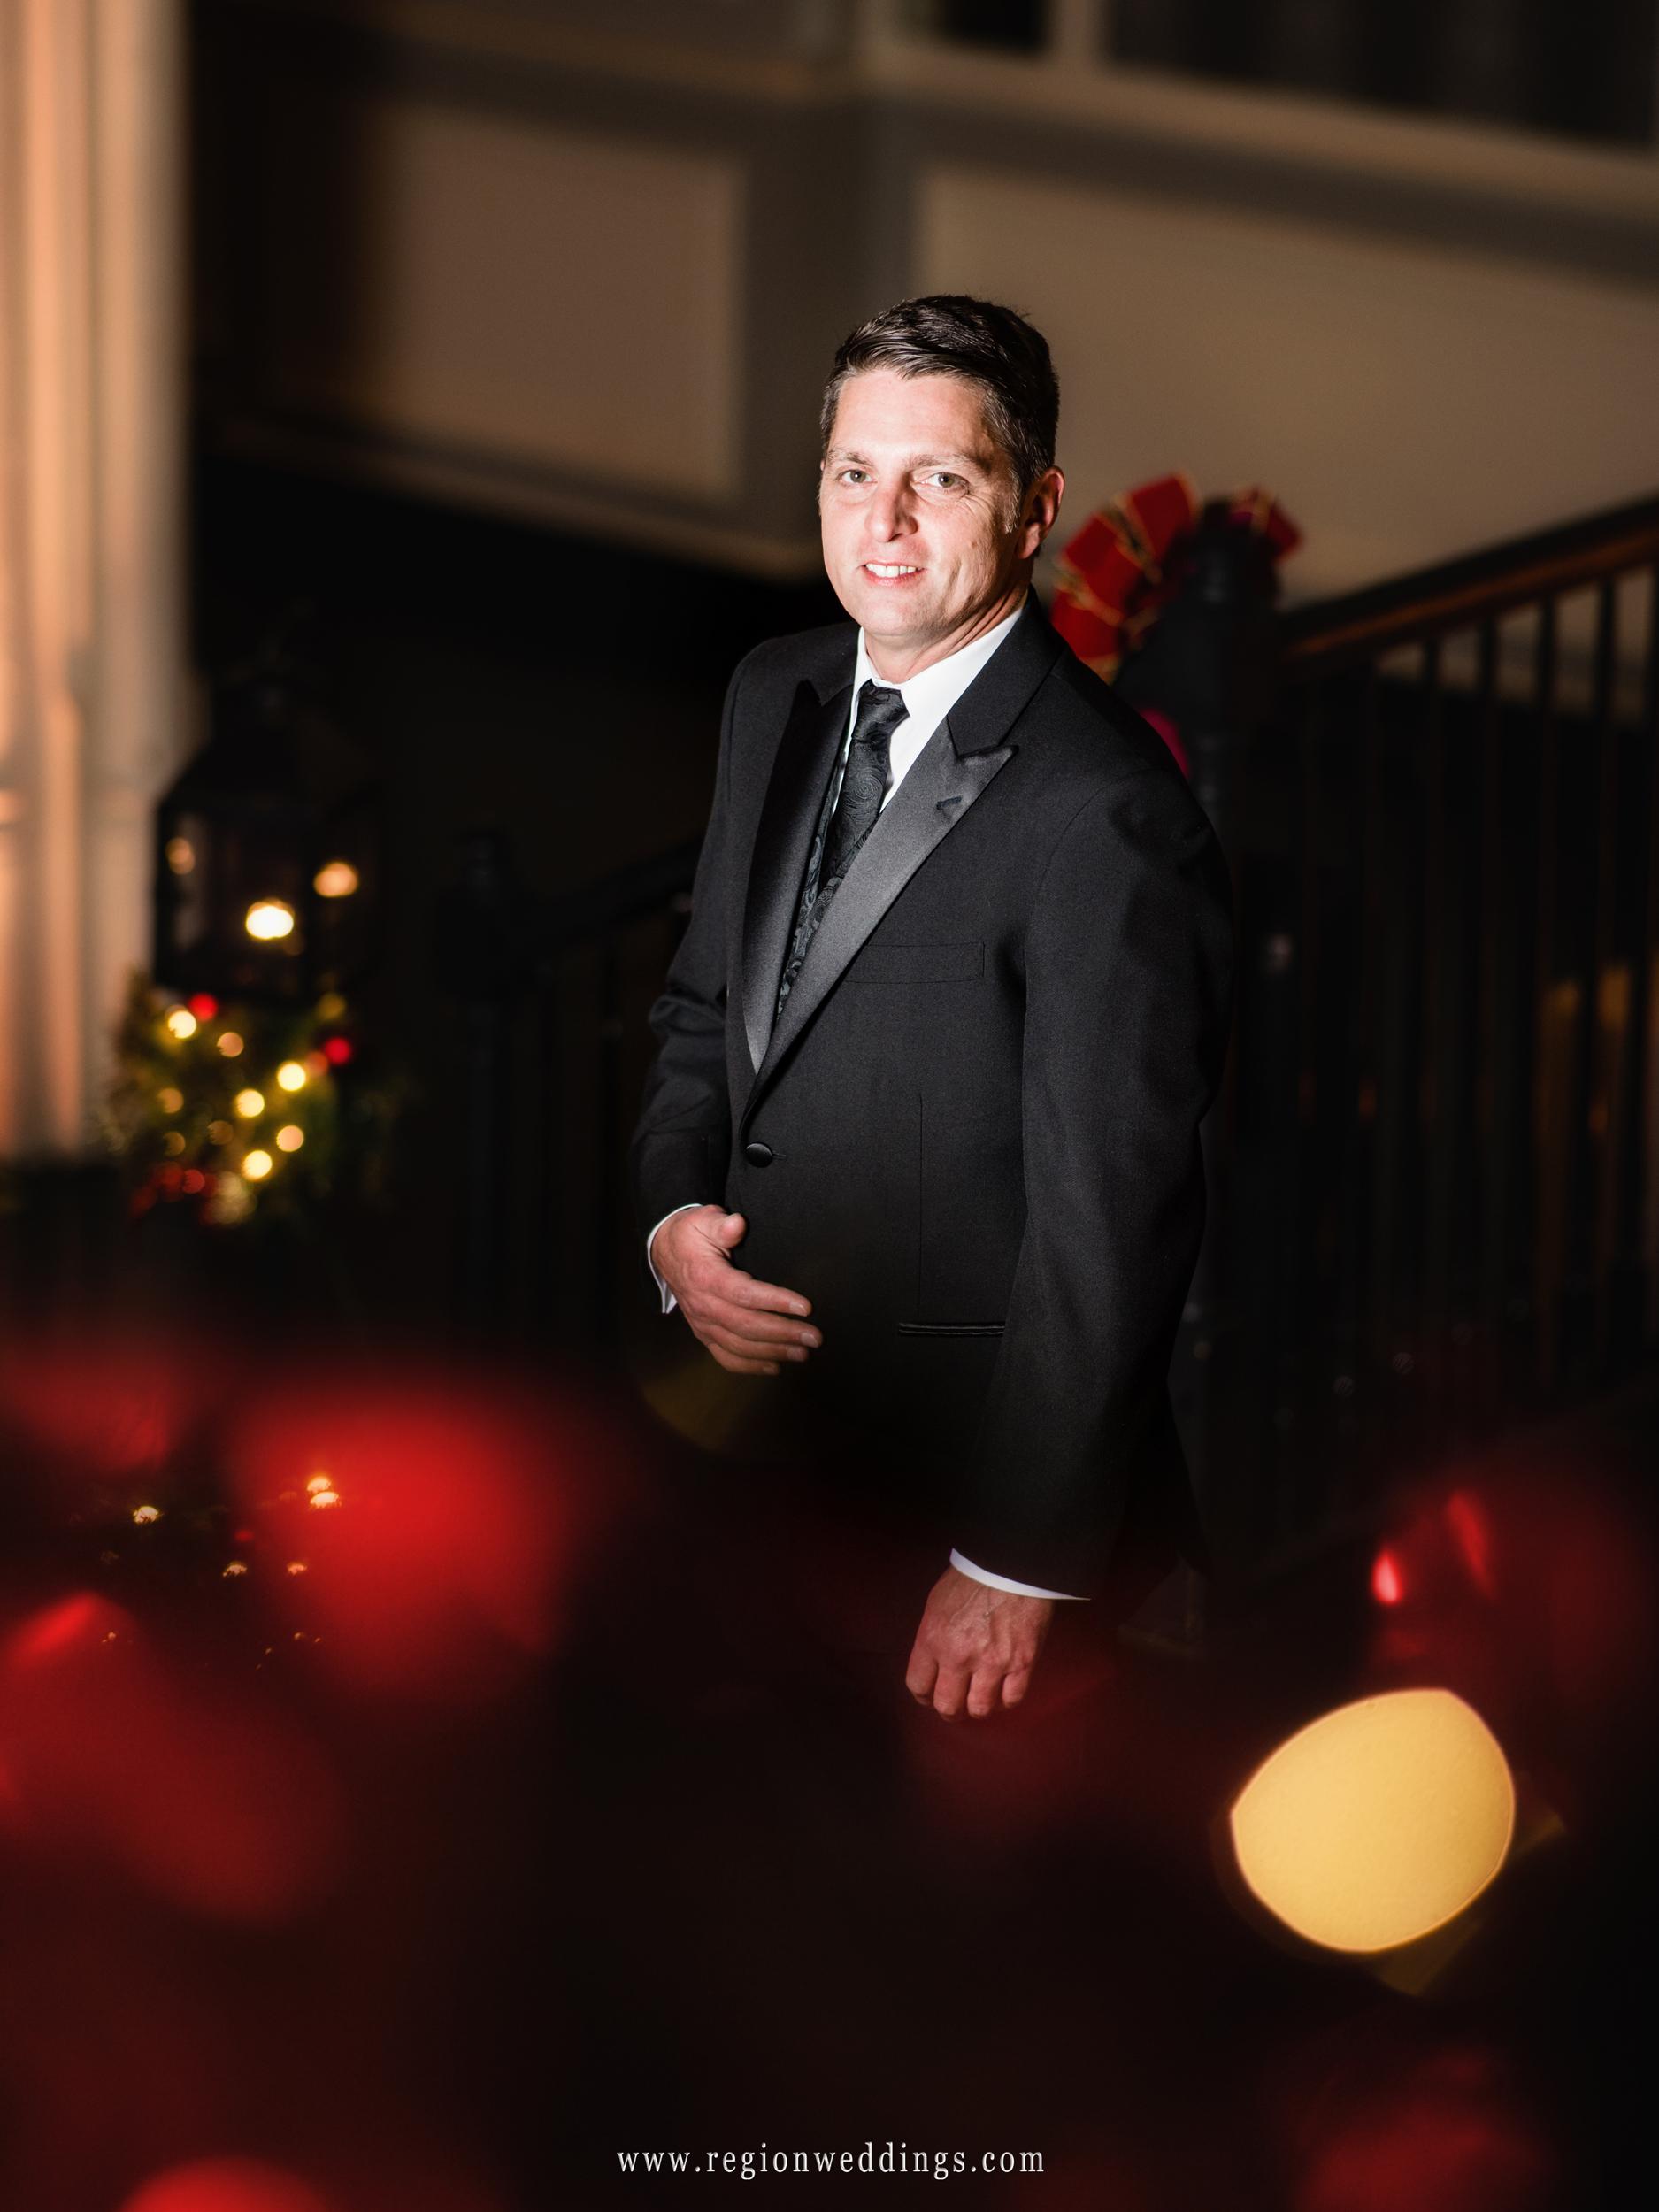 The groom strikes a GQ pose at his Christmas wedding.